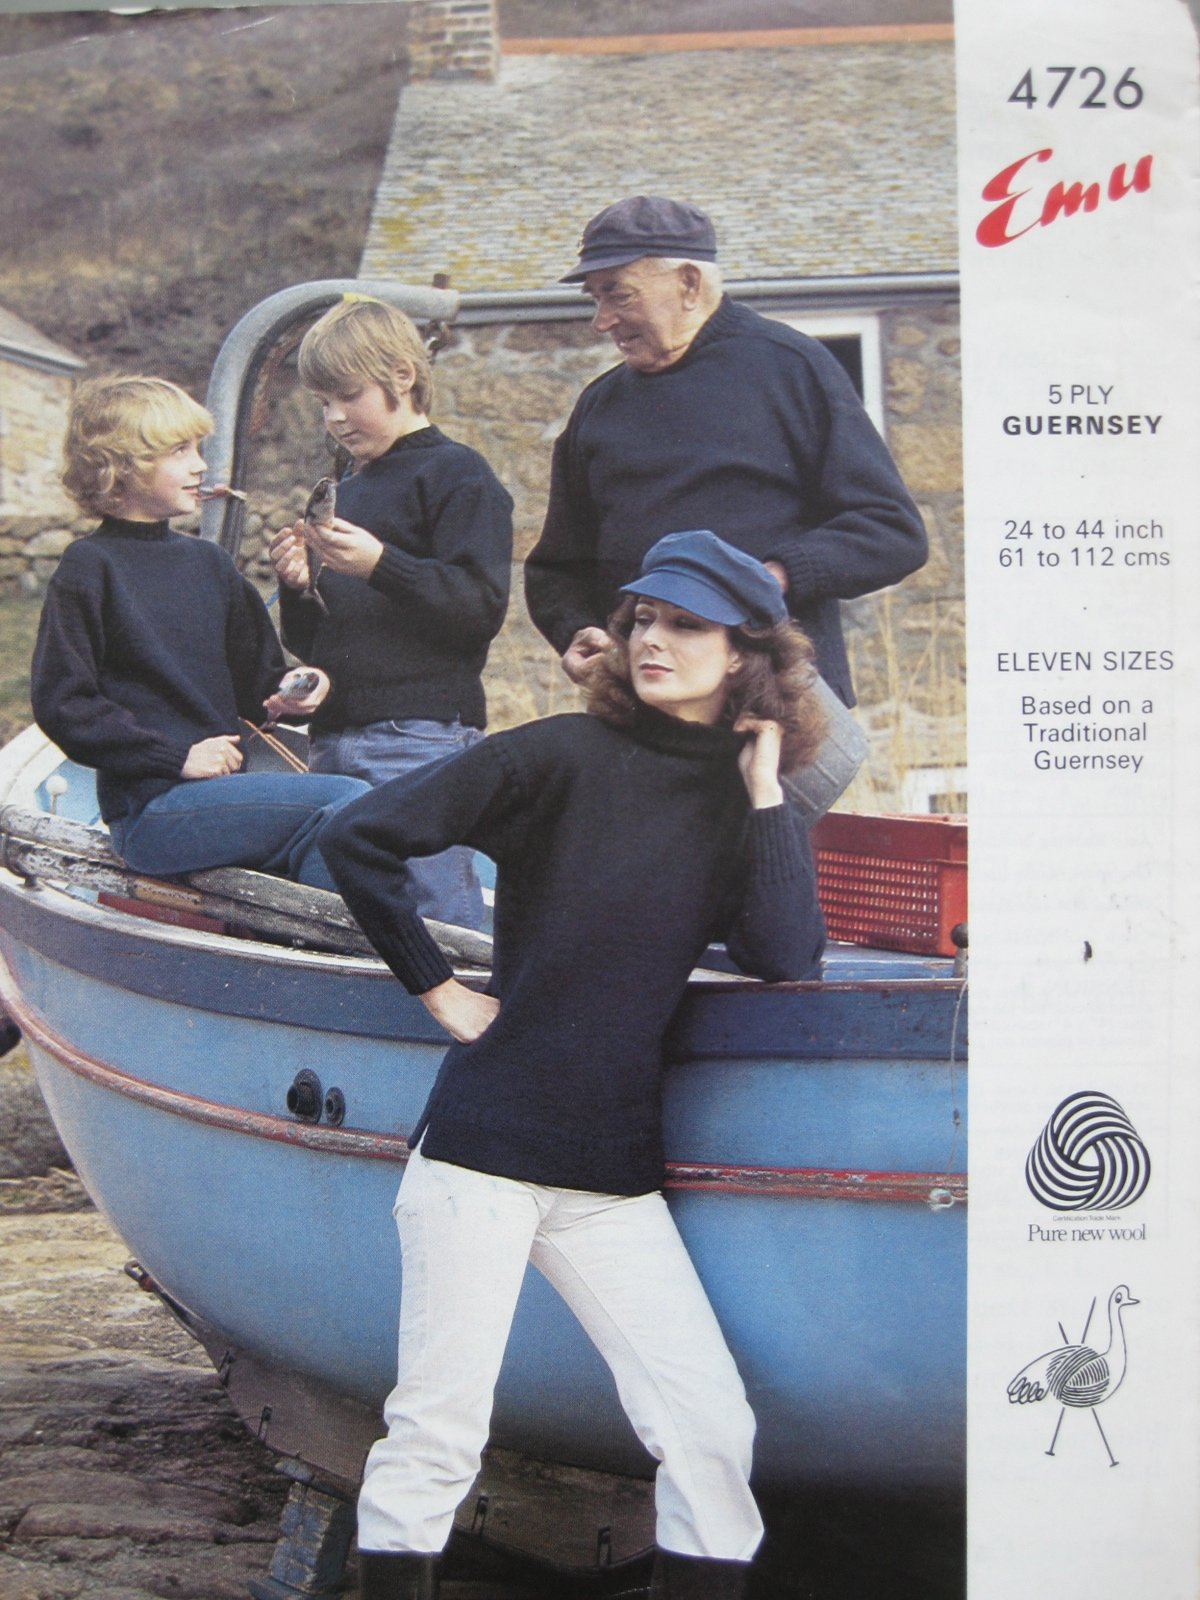 sømandssweater fra Guernsey